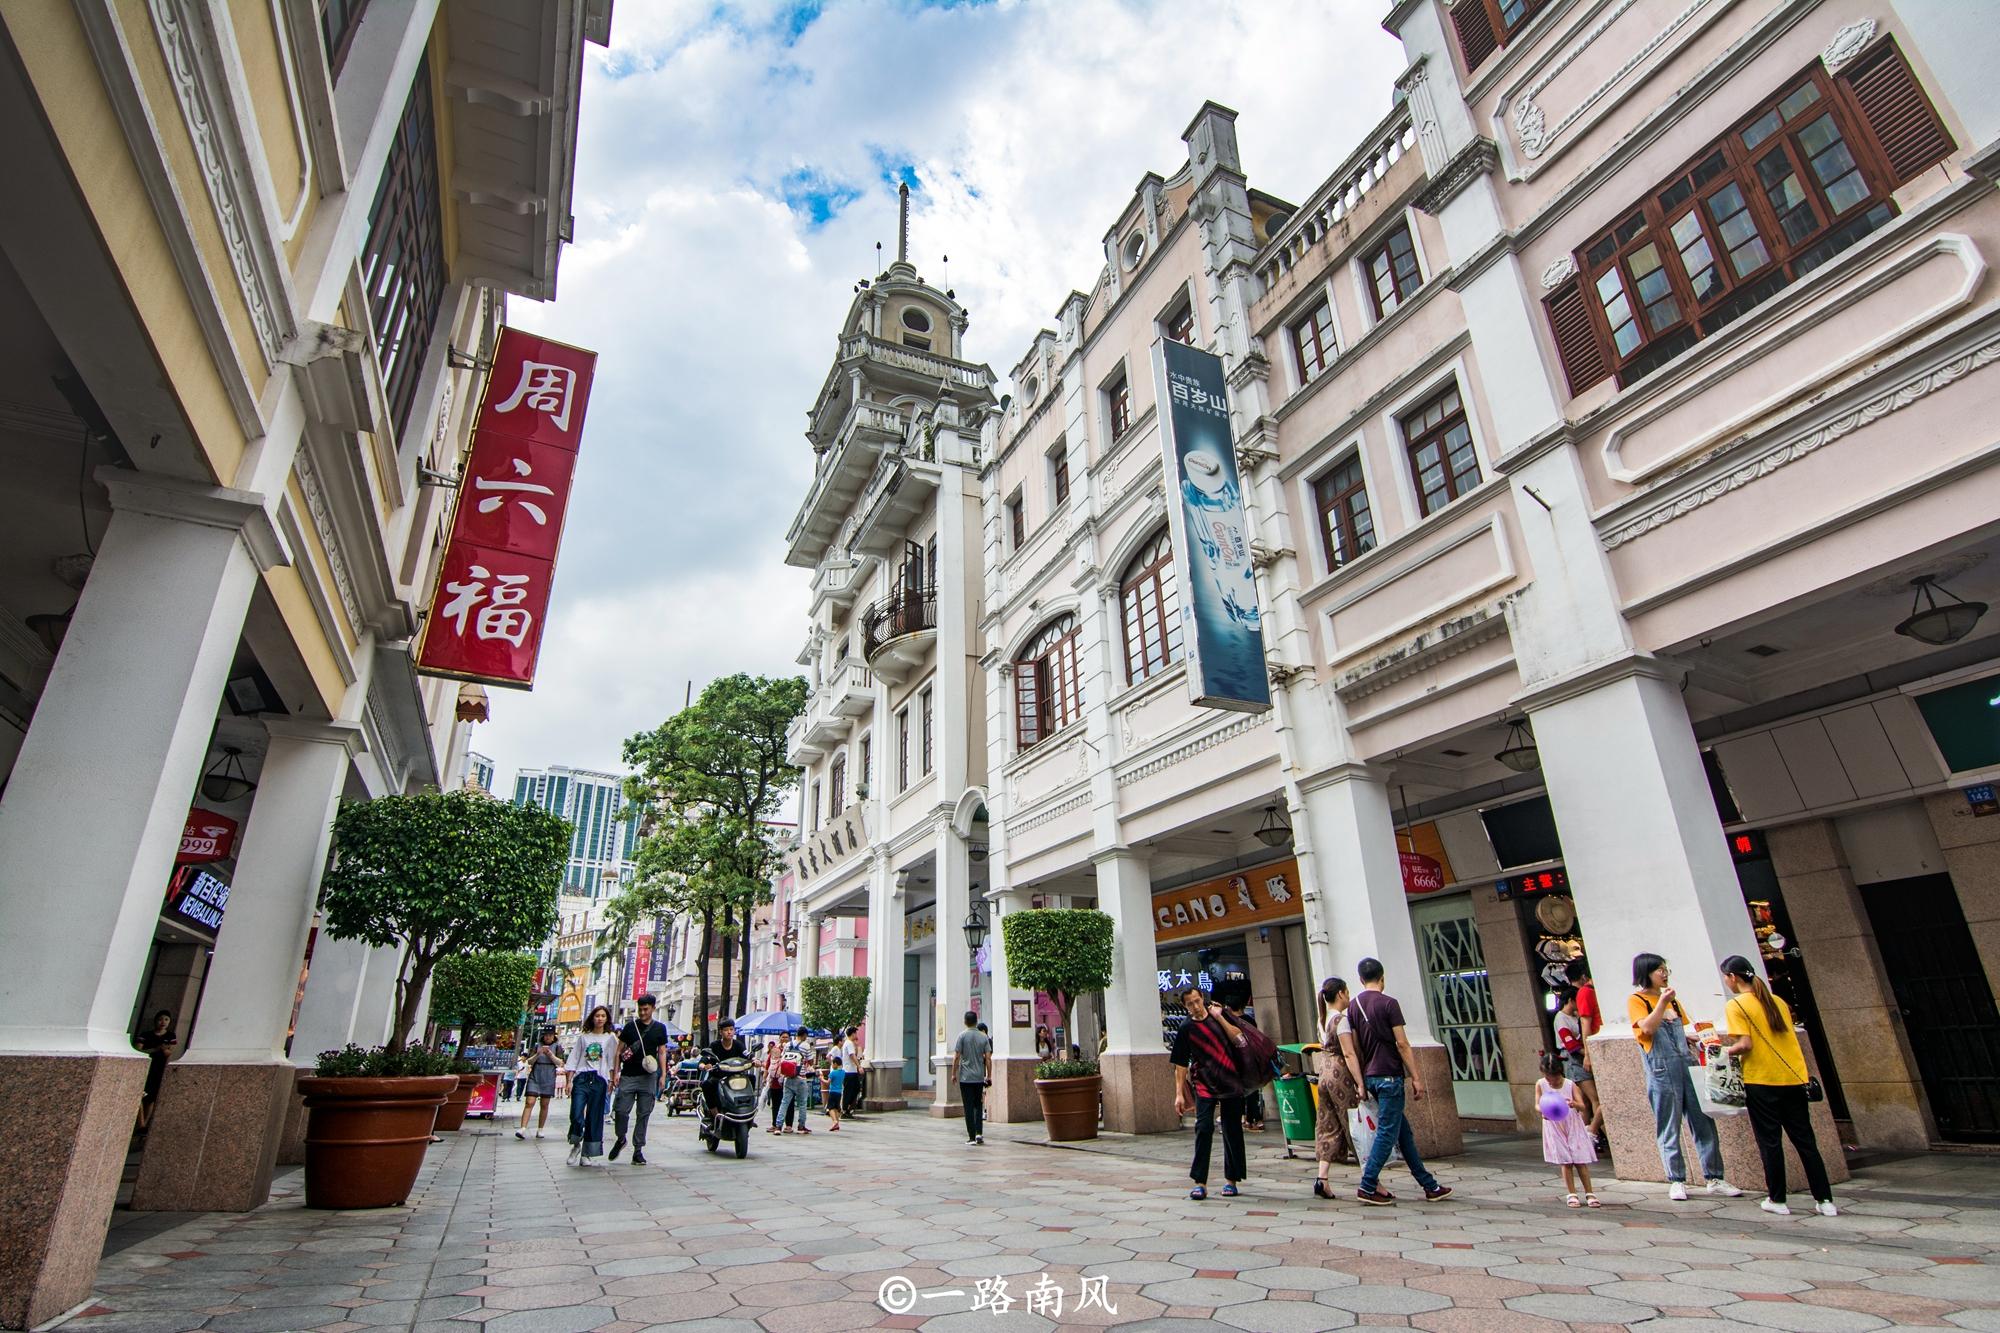 <b>广东有条异国风情街,走廊洋气能避雨,穿行如游电影片场!</b>